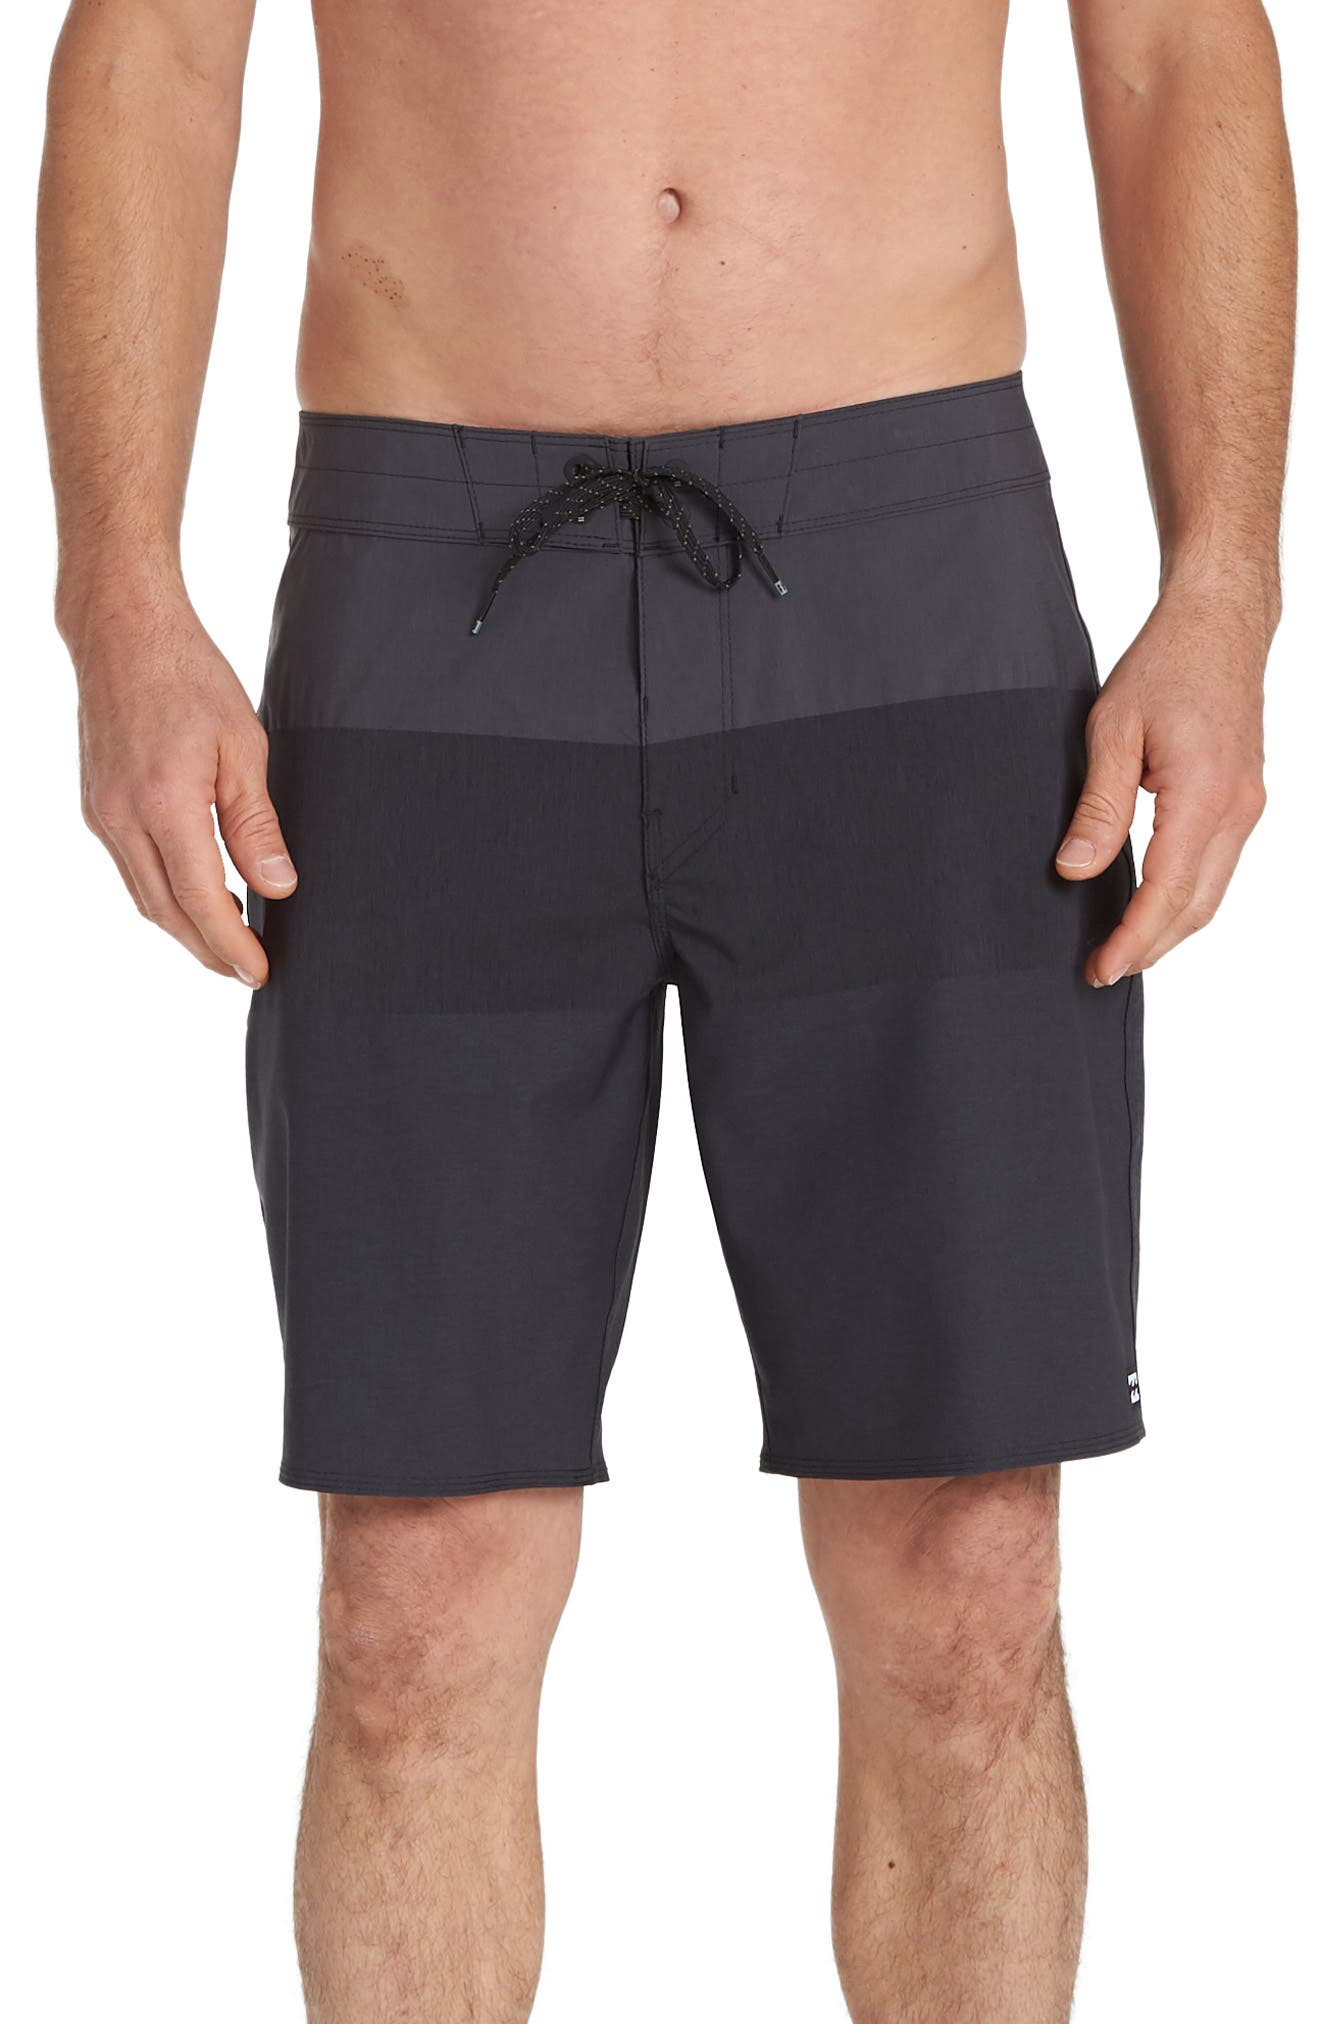 Billabong Airlite Board Shorts, Black